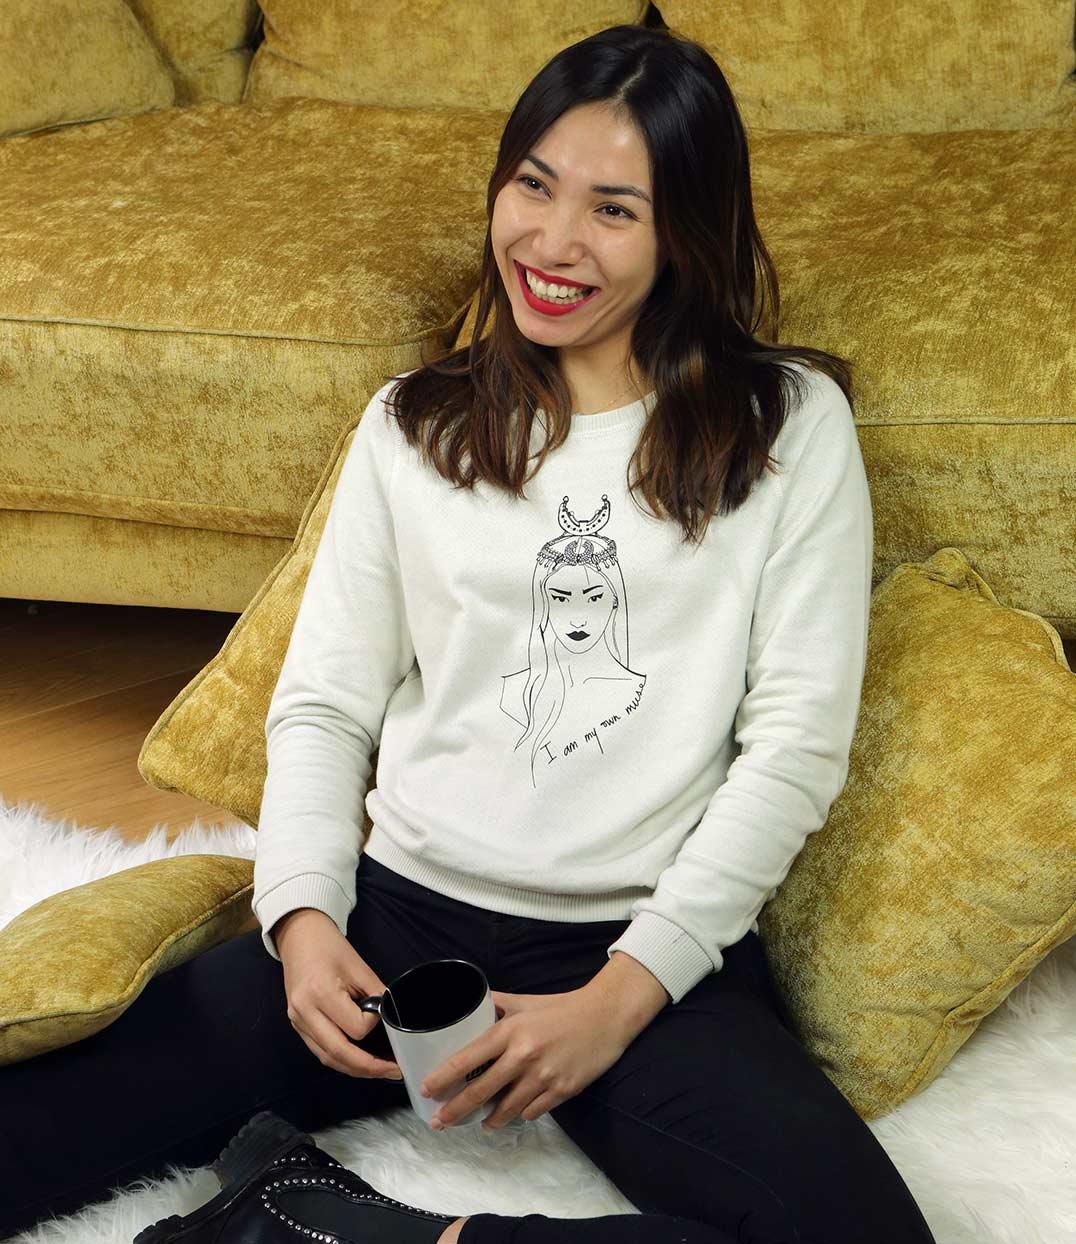 femme assise souriante portant sweatshirt vintage coyoqui creme leonor roversi